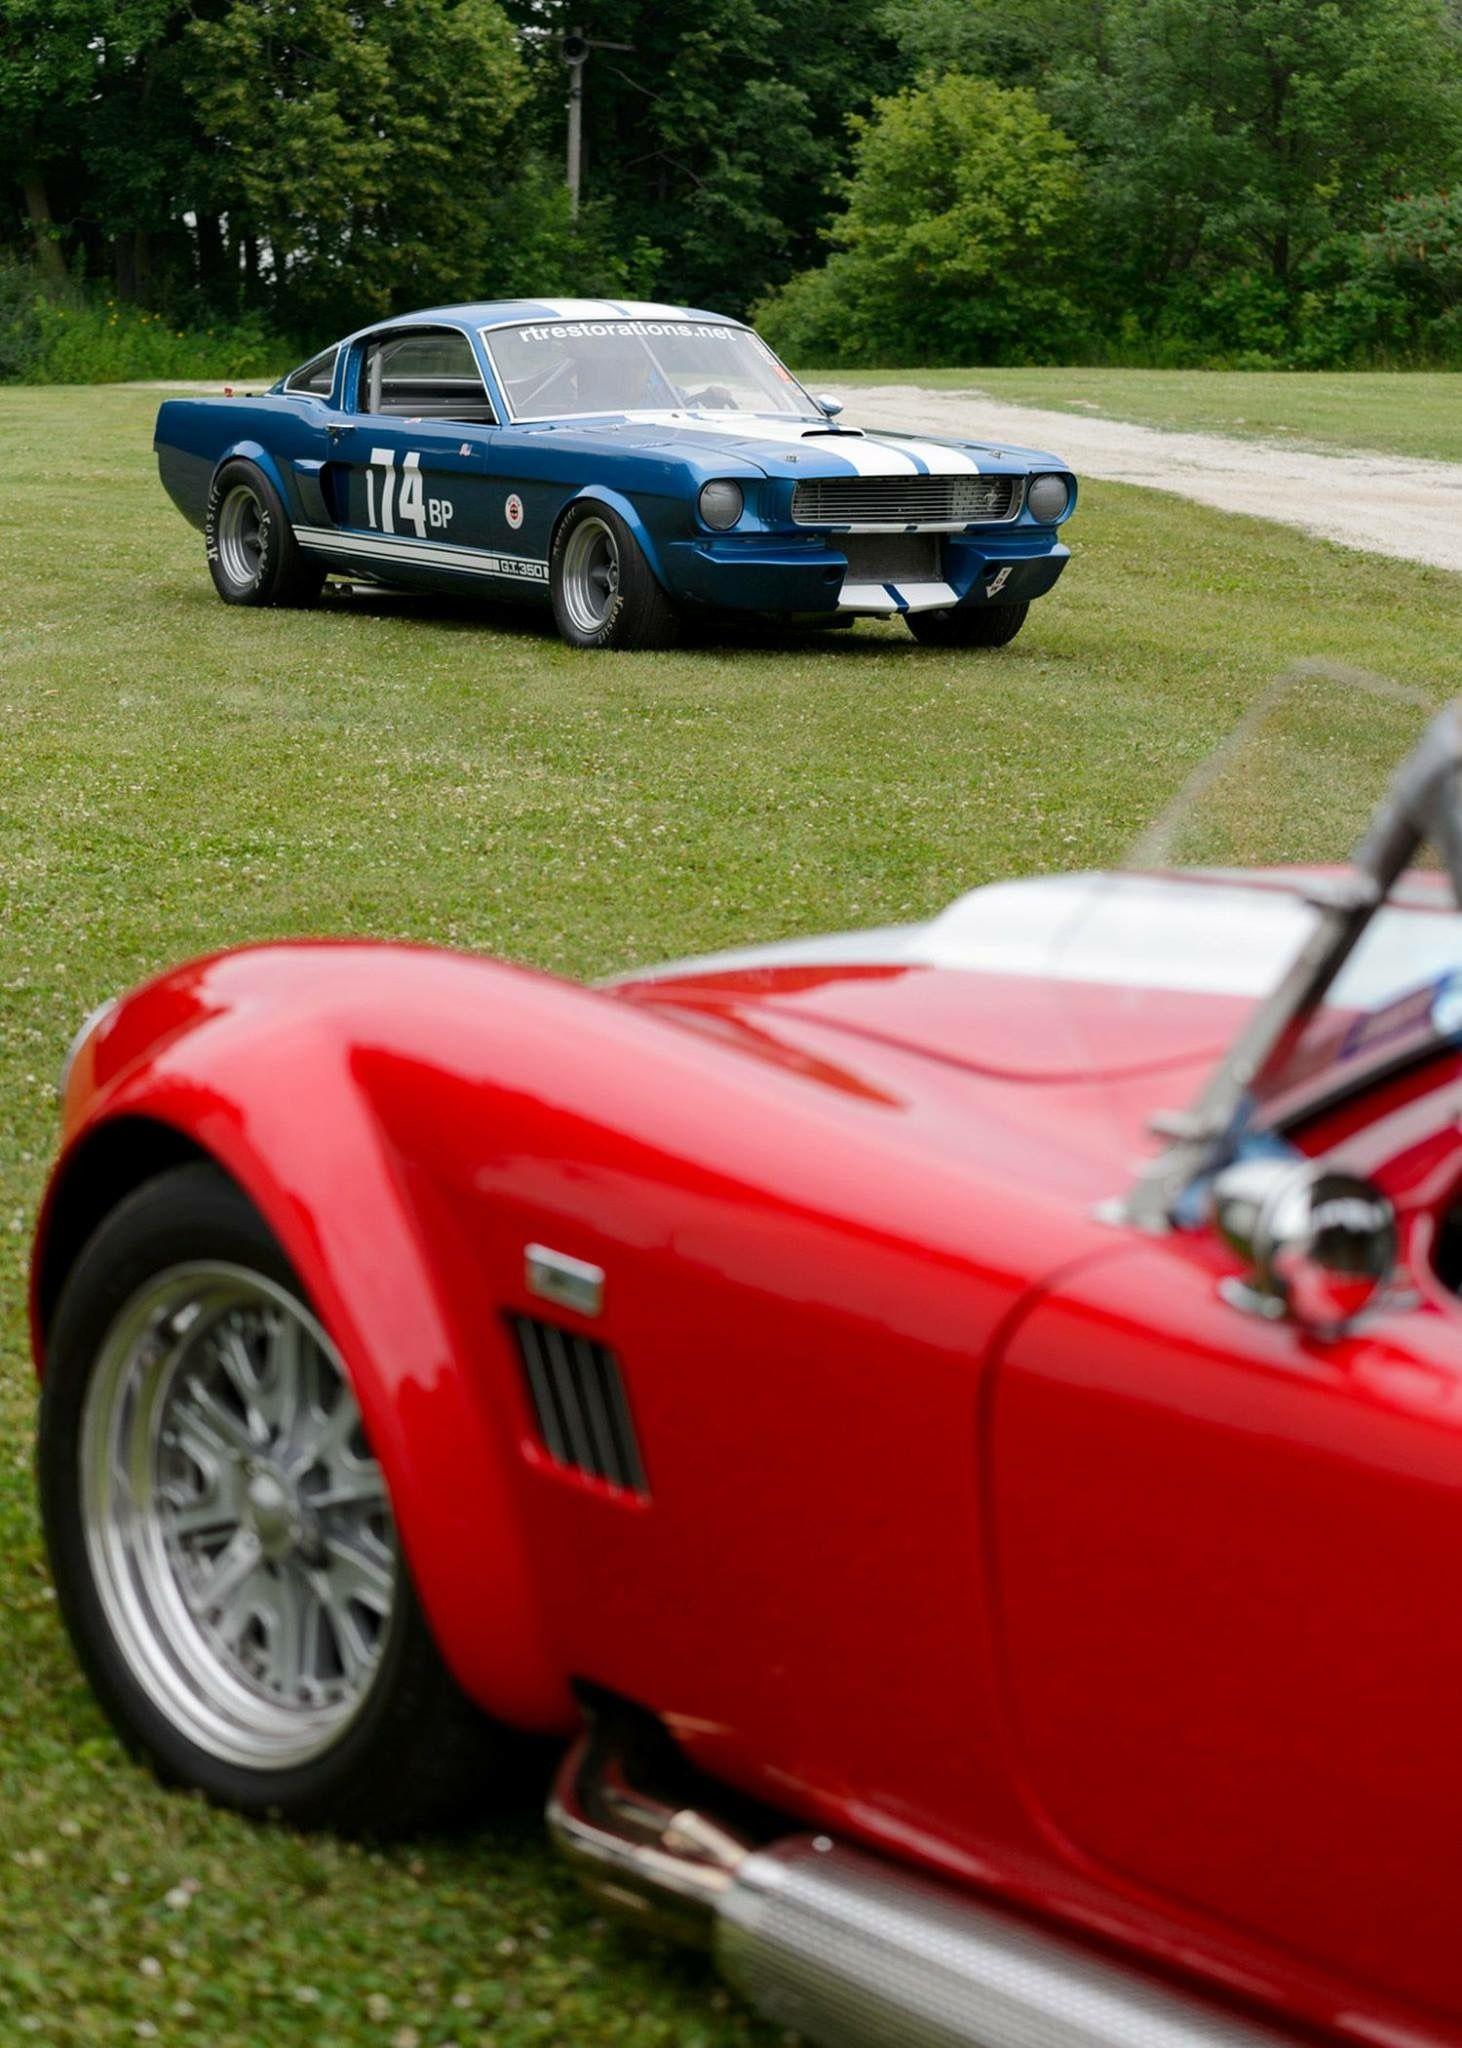 Pin by John Robbins on My kind of Mustangs | 65 mustang